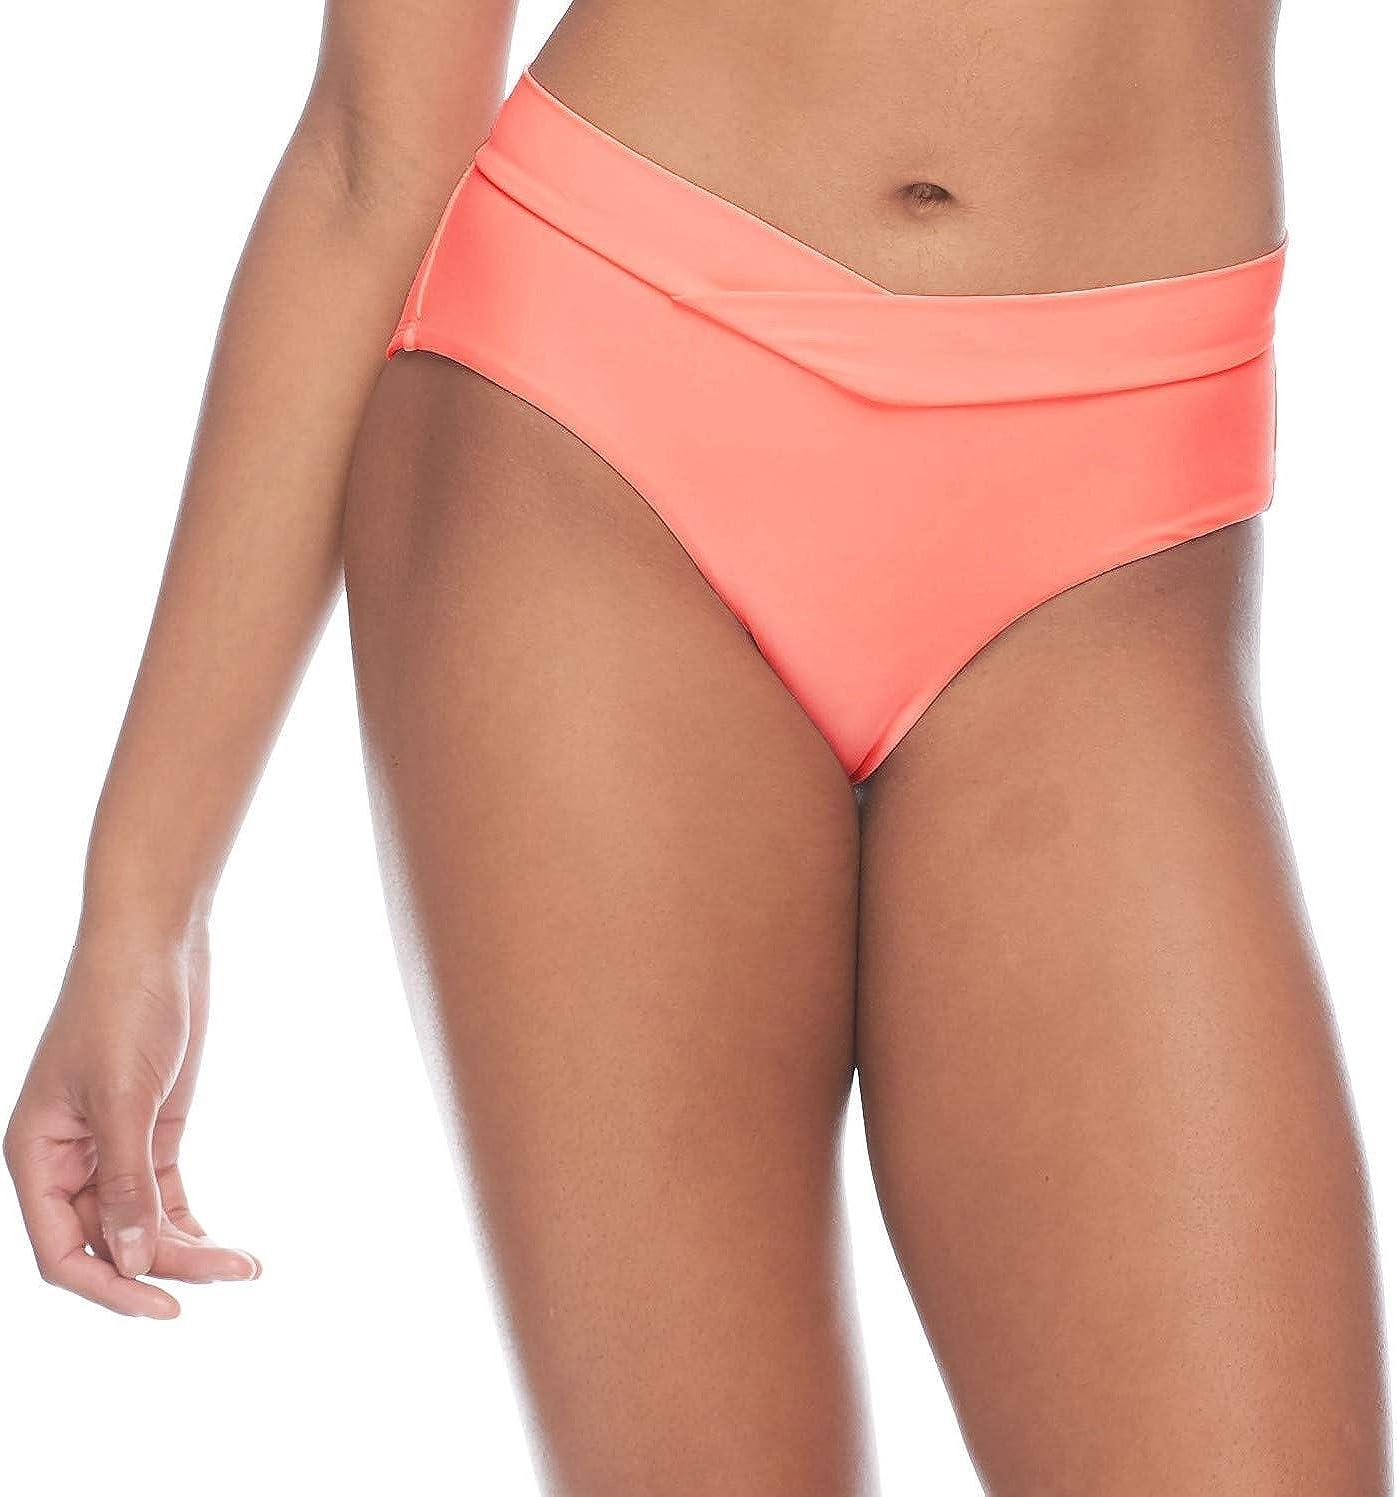 Body Glove Women's Standard Smoothies Nuevo Retro Solid High Rise Bikini Bottom Swimsuit